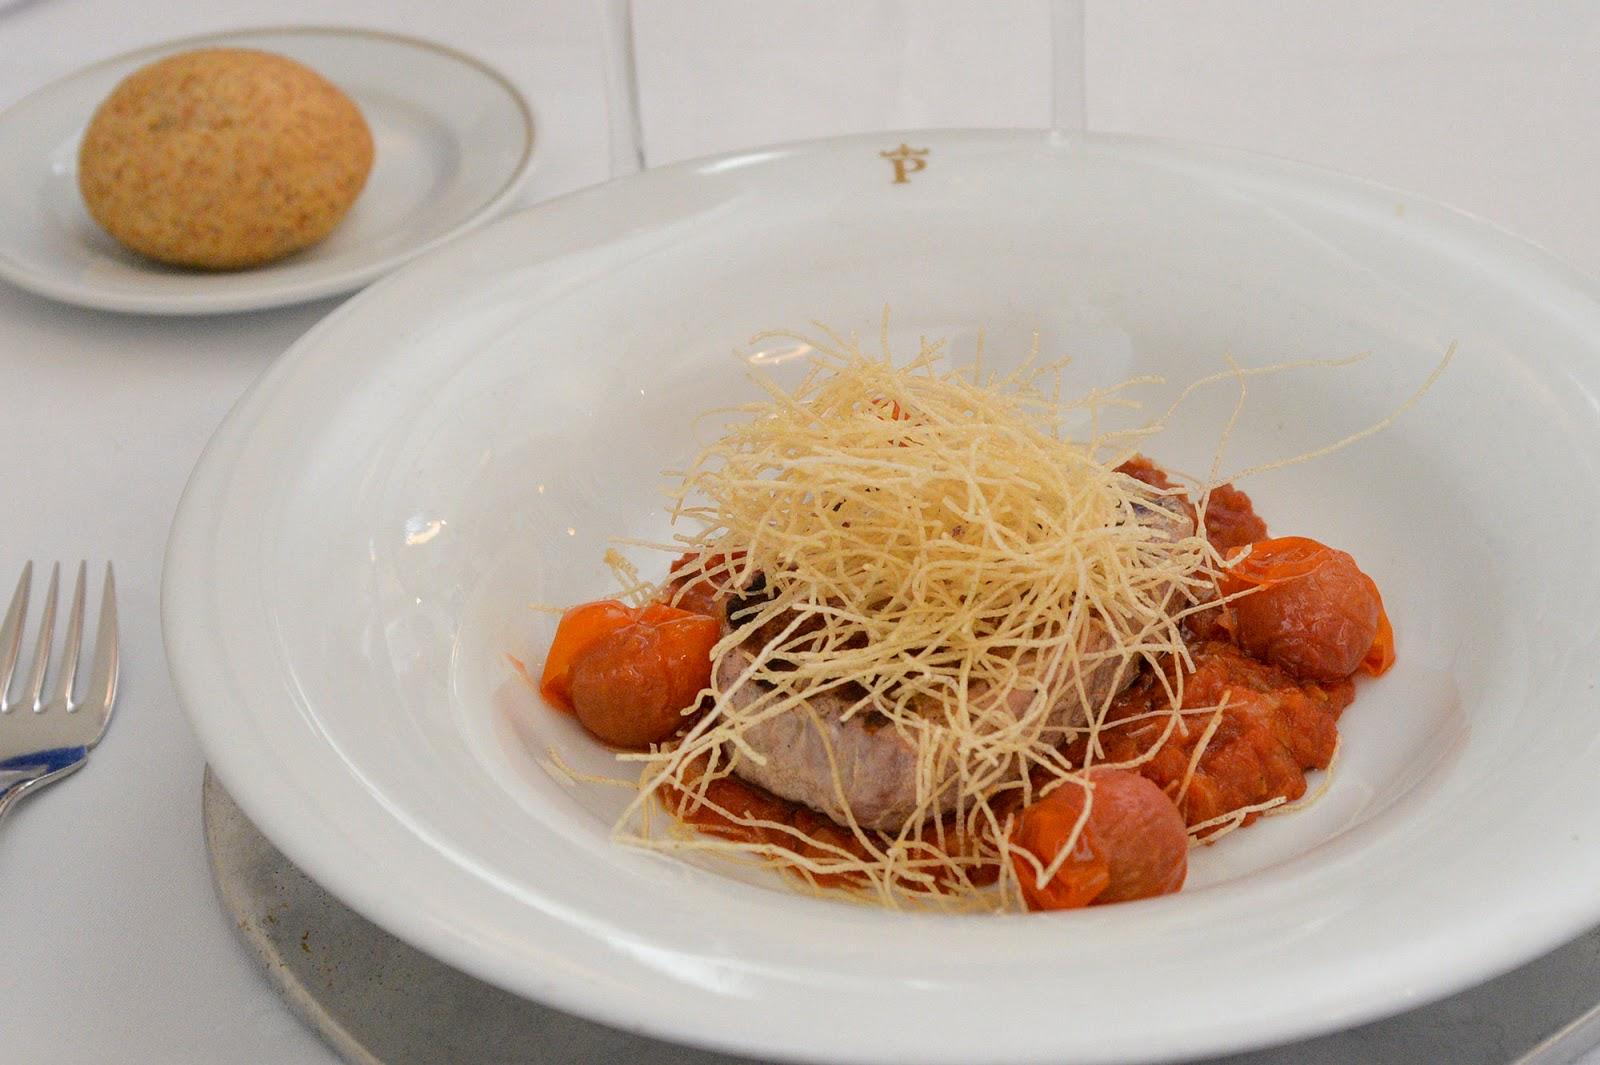 segovia spain travel guide weekend parador menu typical food